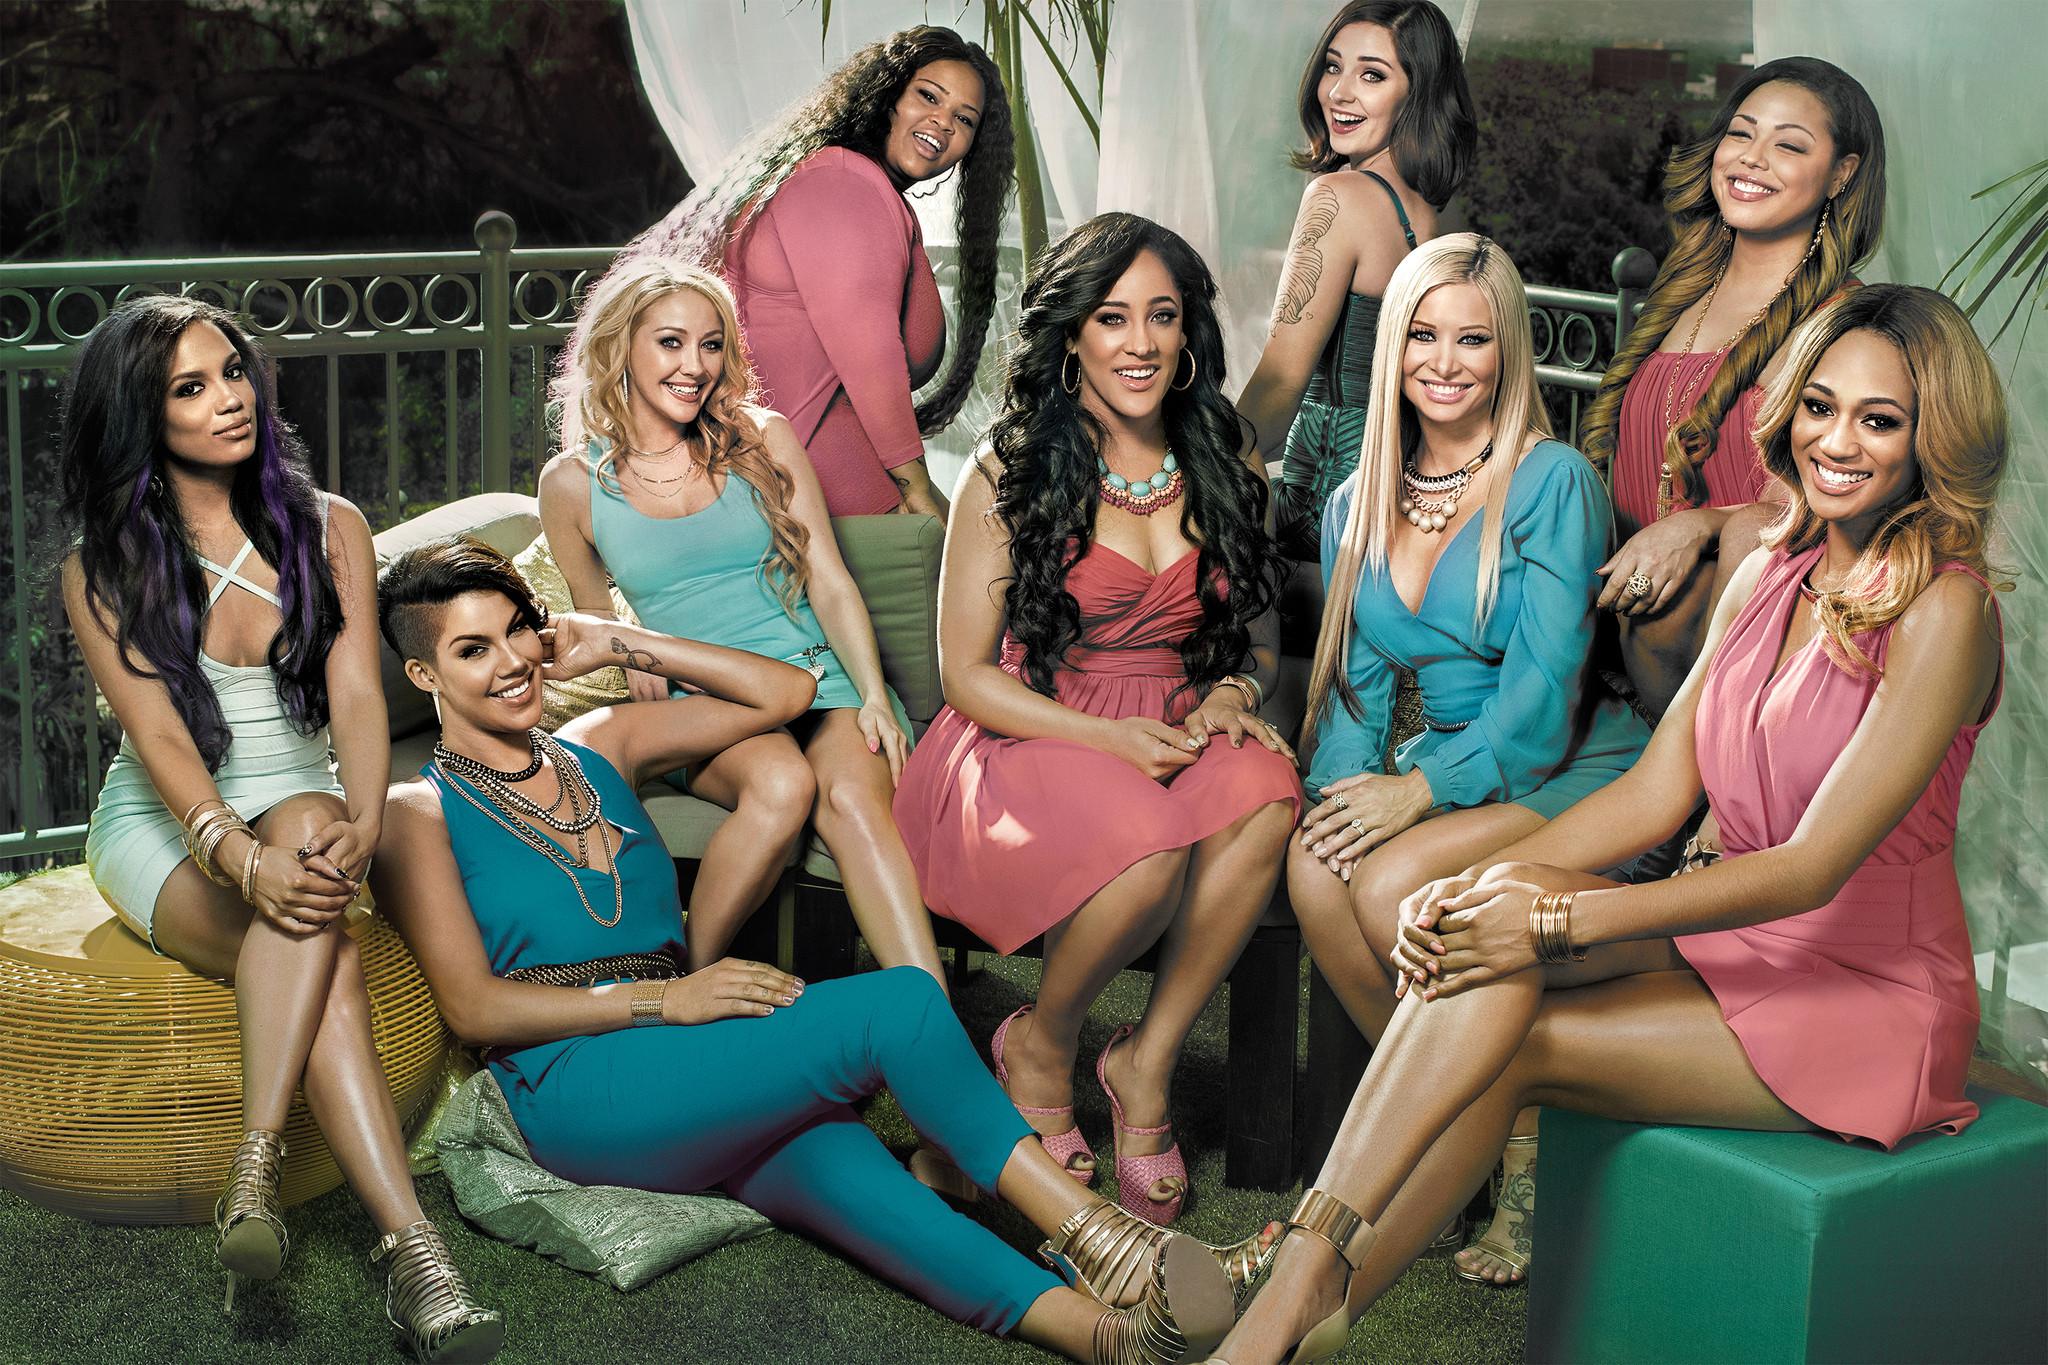 girls in a club